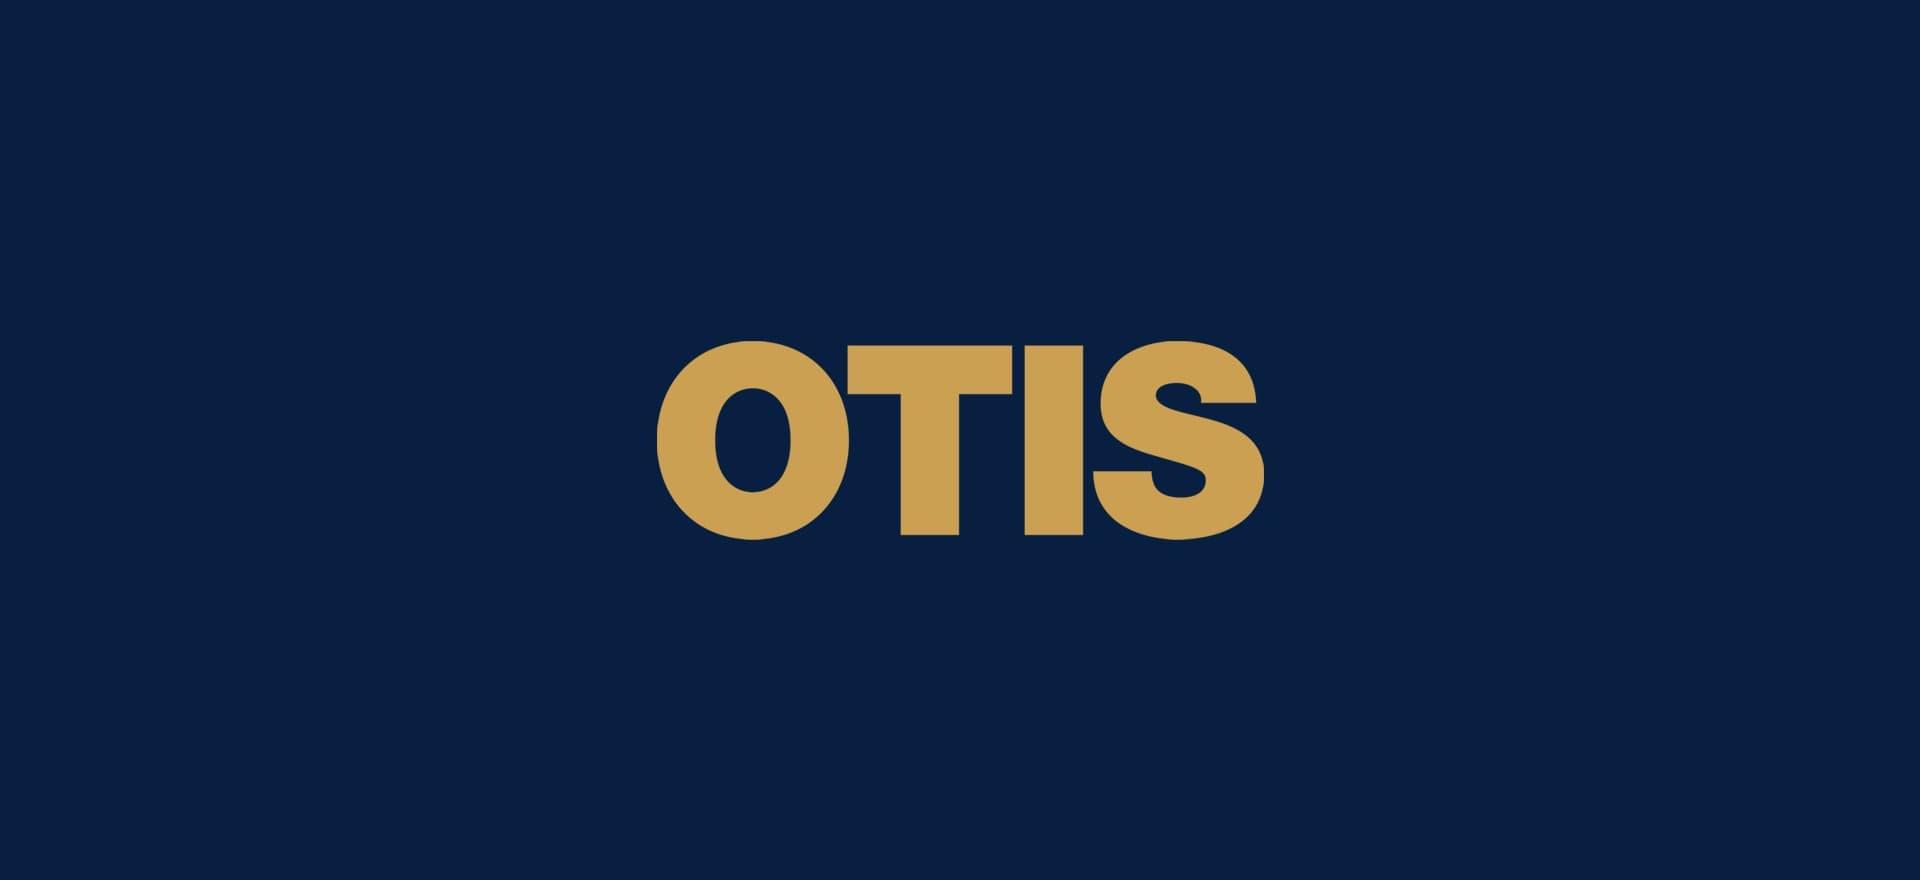 otis_video_fullwidth_image